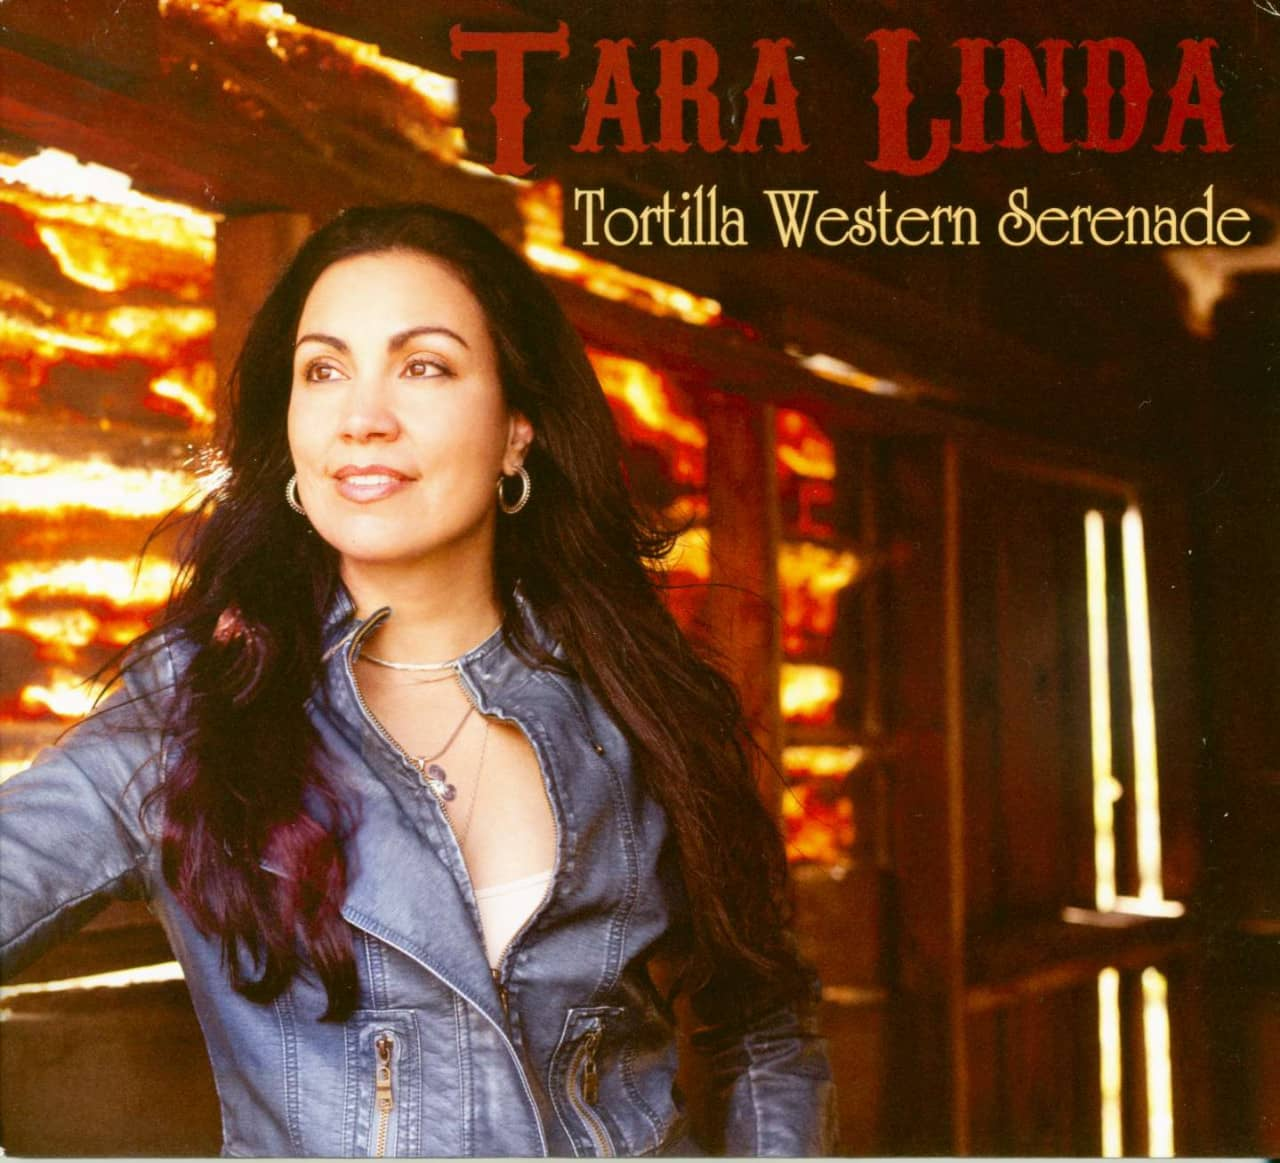 Tara Linda - Tortilla Western Serenade